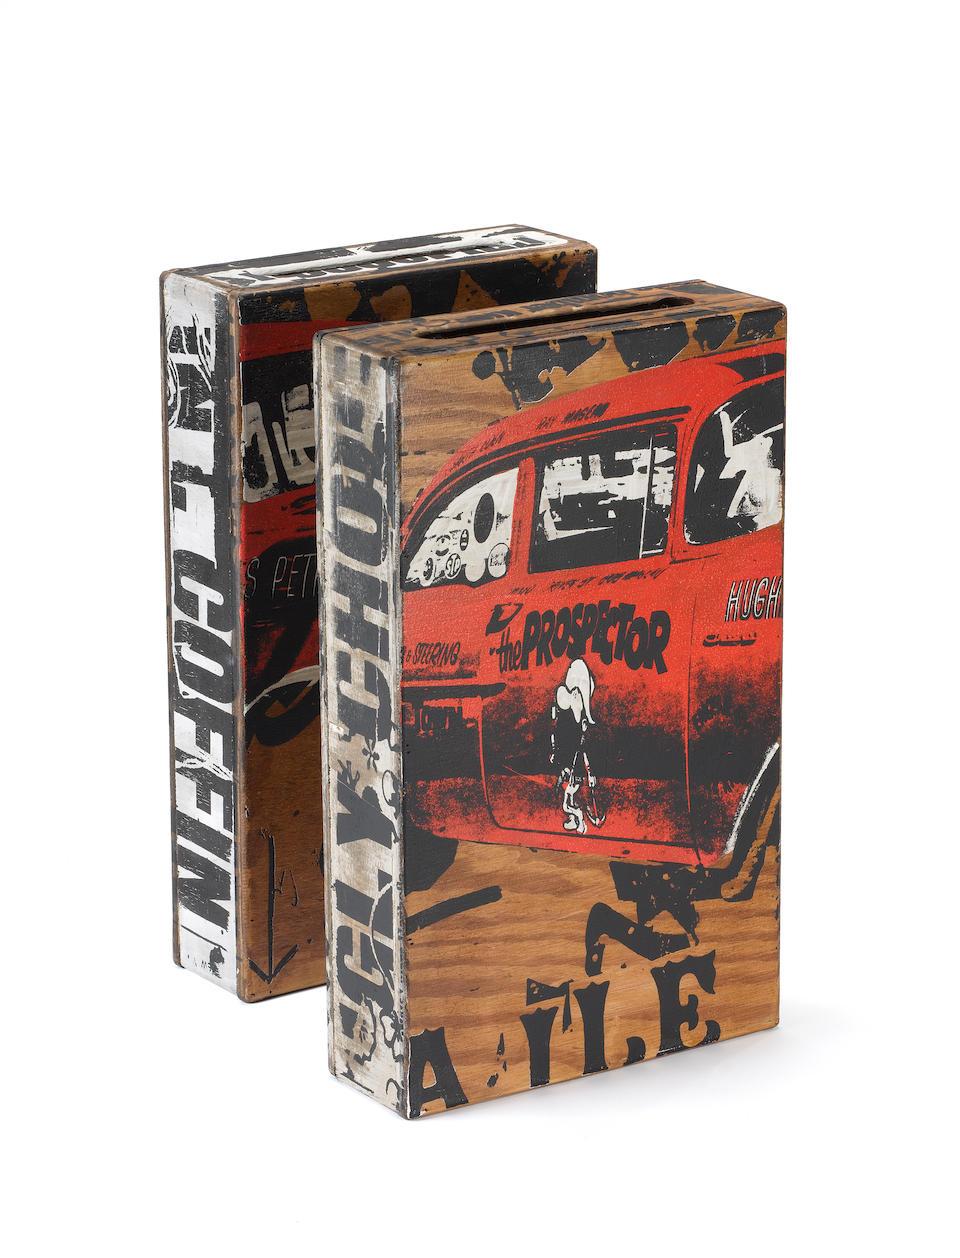 Faile (American, Canadian, Japanese) 'Faile Box London # 38', 2007